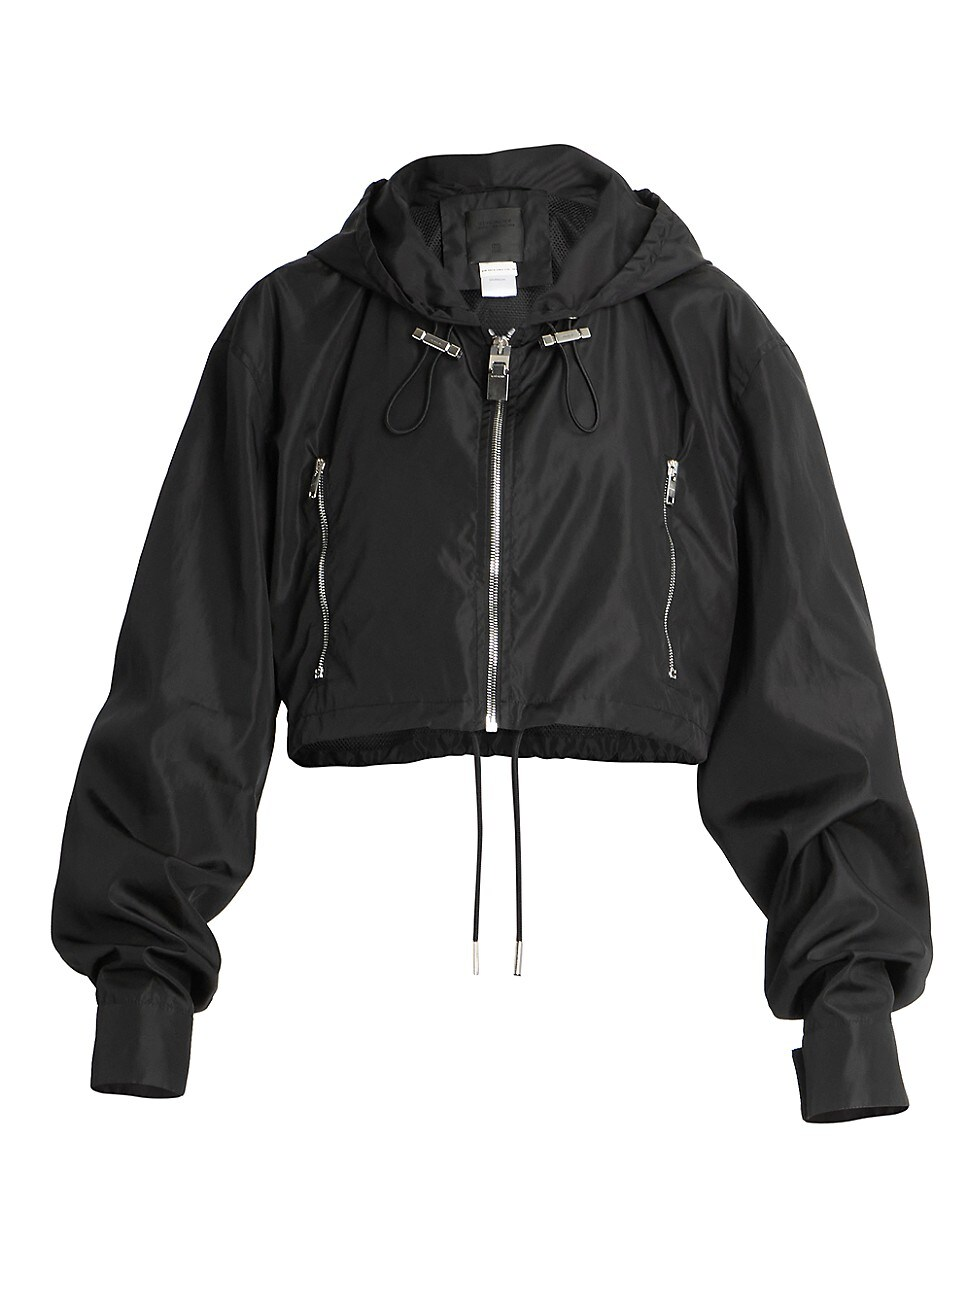 Givenchy Jackets WOMEN'S CROPPED LOGO WINDBREAKER